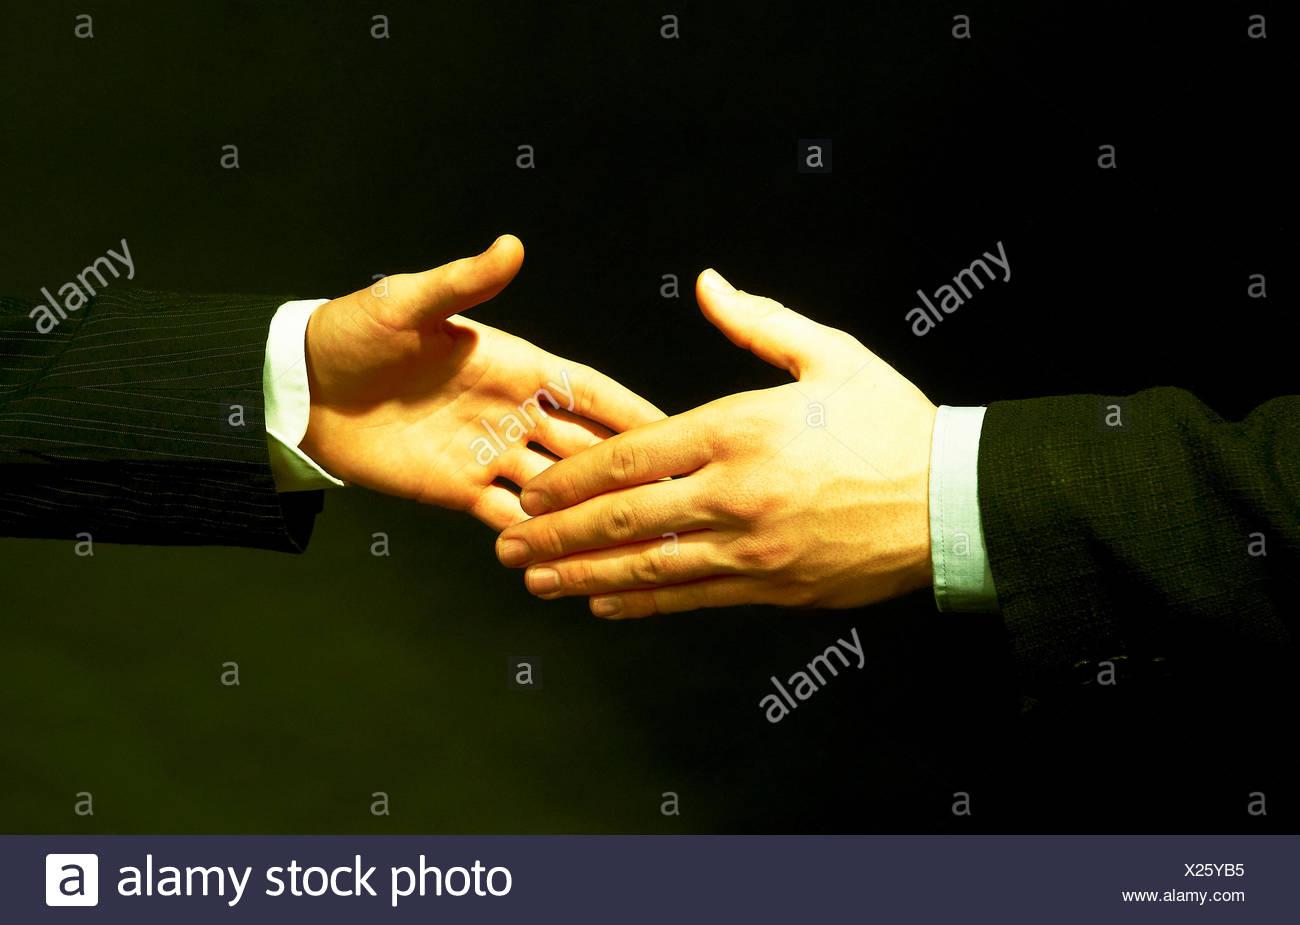 Hands,hand,Merger,union,unite,handshake,business,men,economy - Stock Image